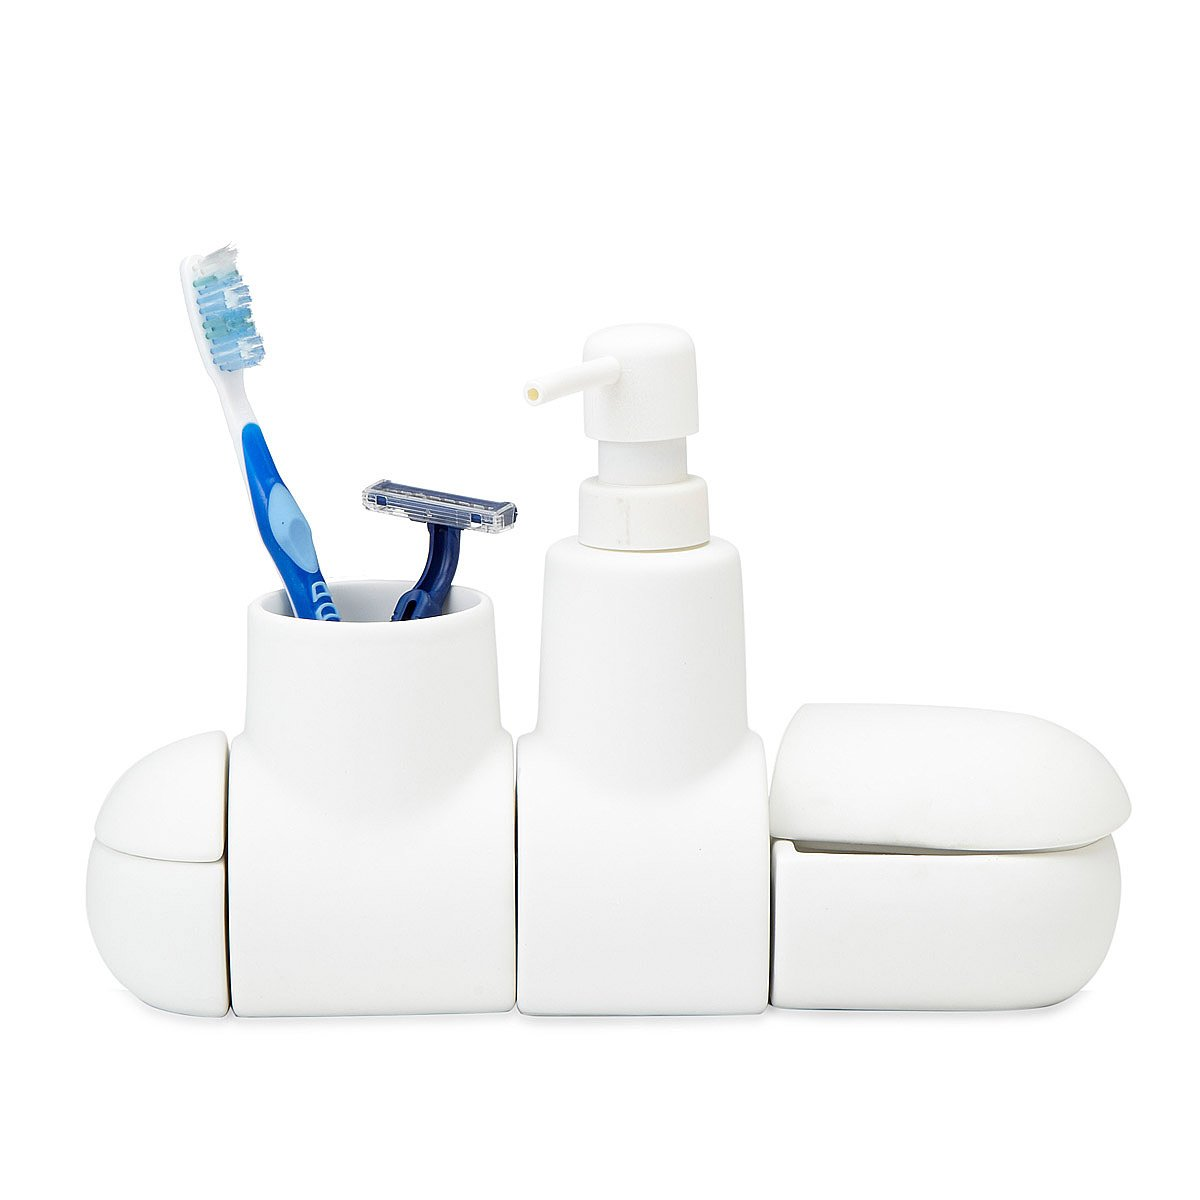 Submarino Porcelain Bathroom Accessory Set | bathroom containers ...